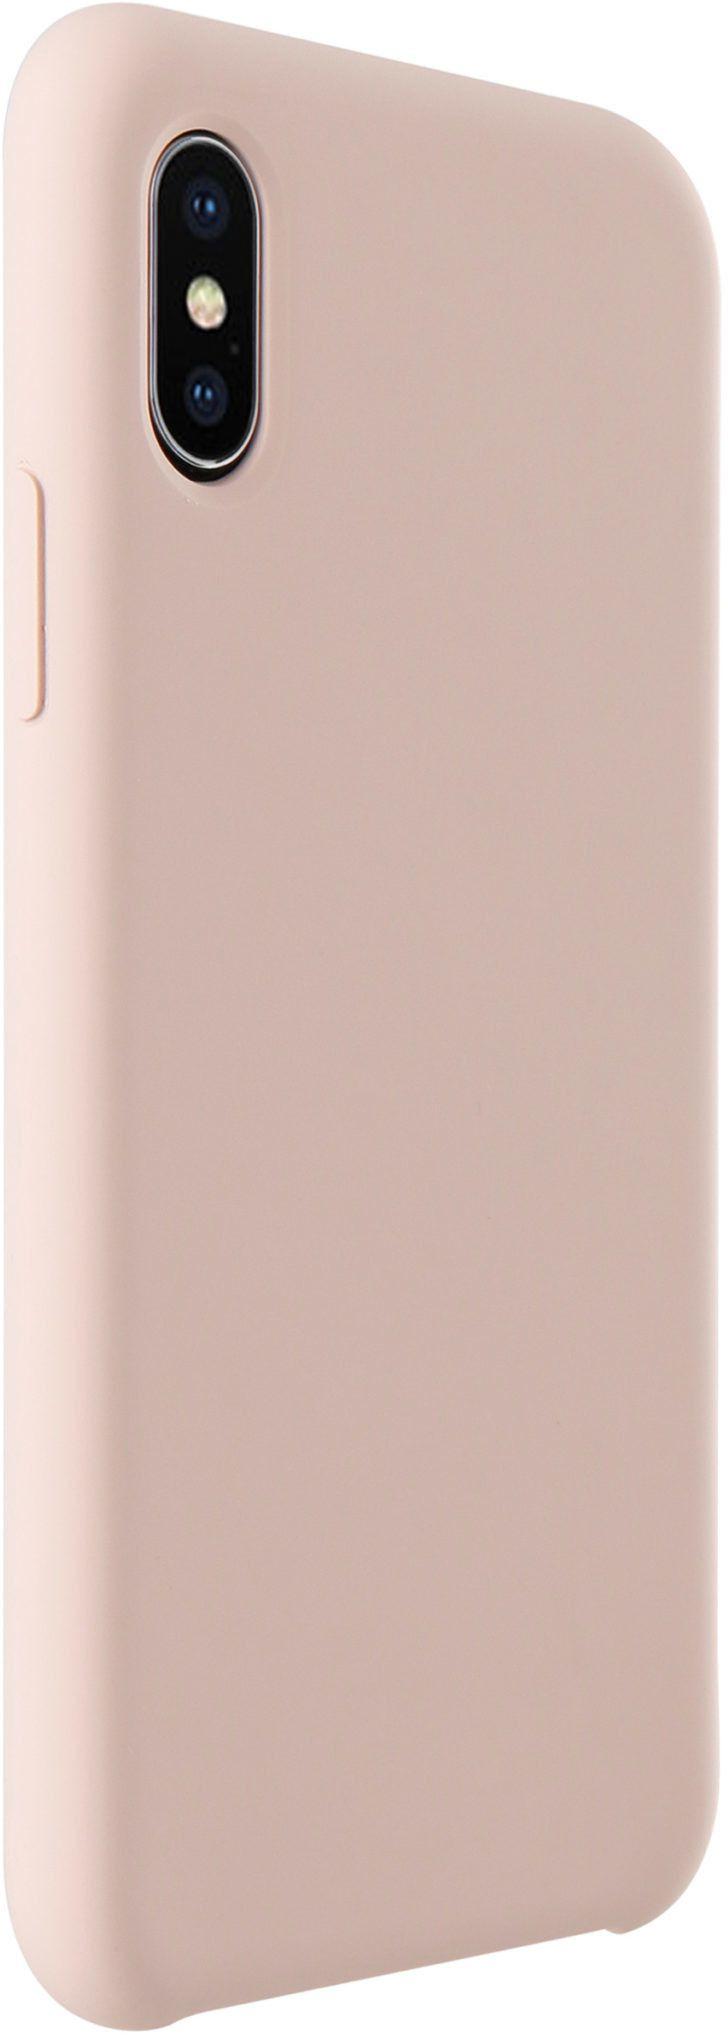 Vivanco Silkonskal iPhone